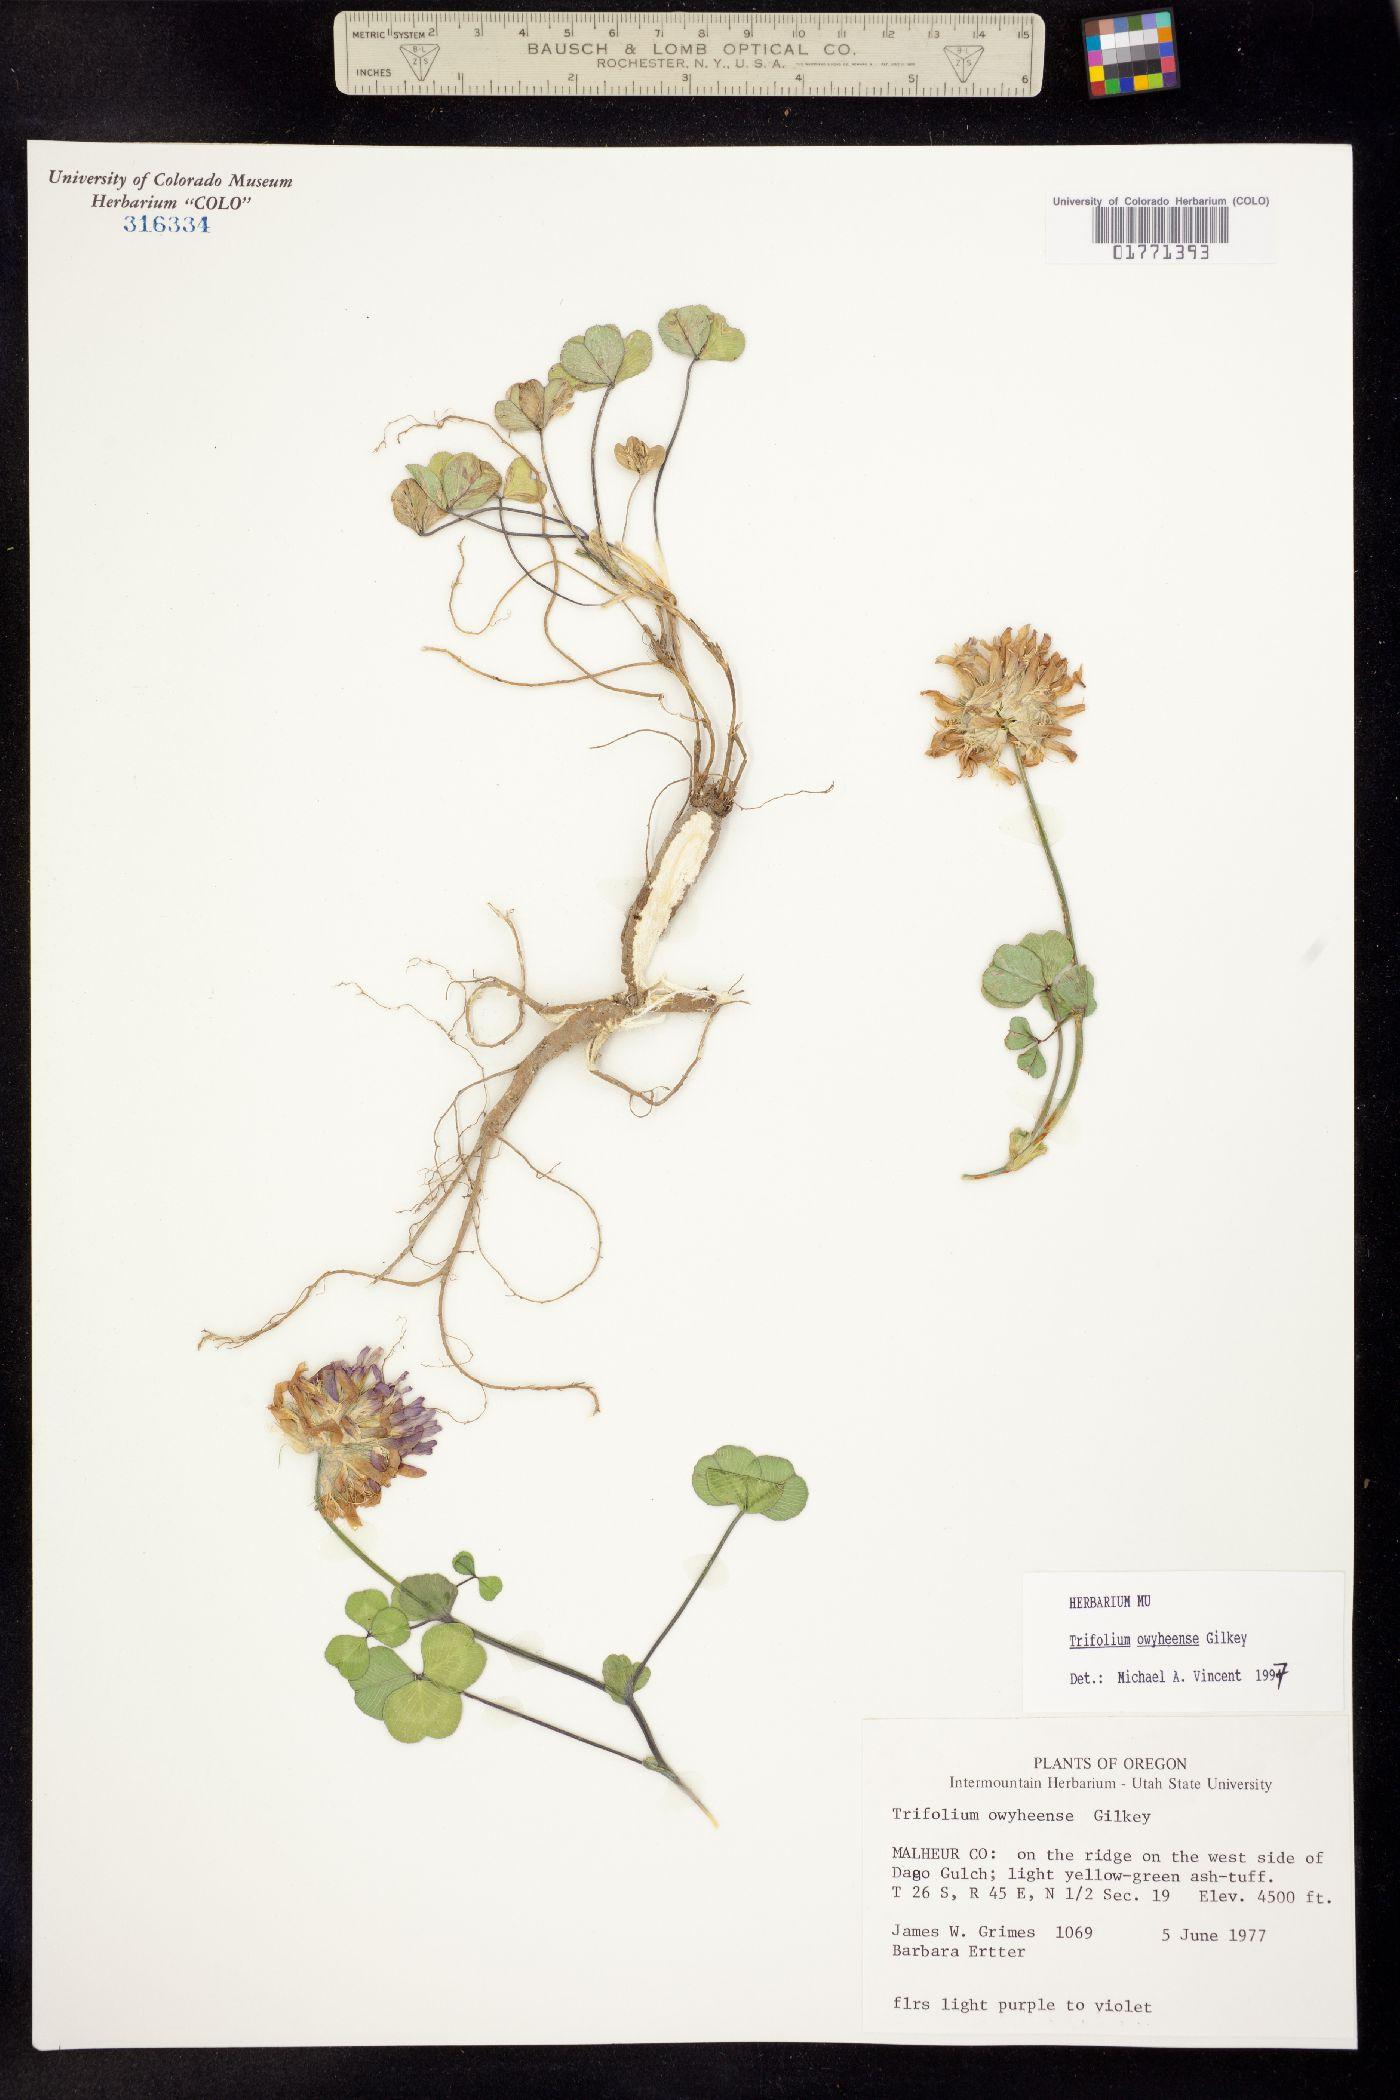 Trifolium owyheense image